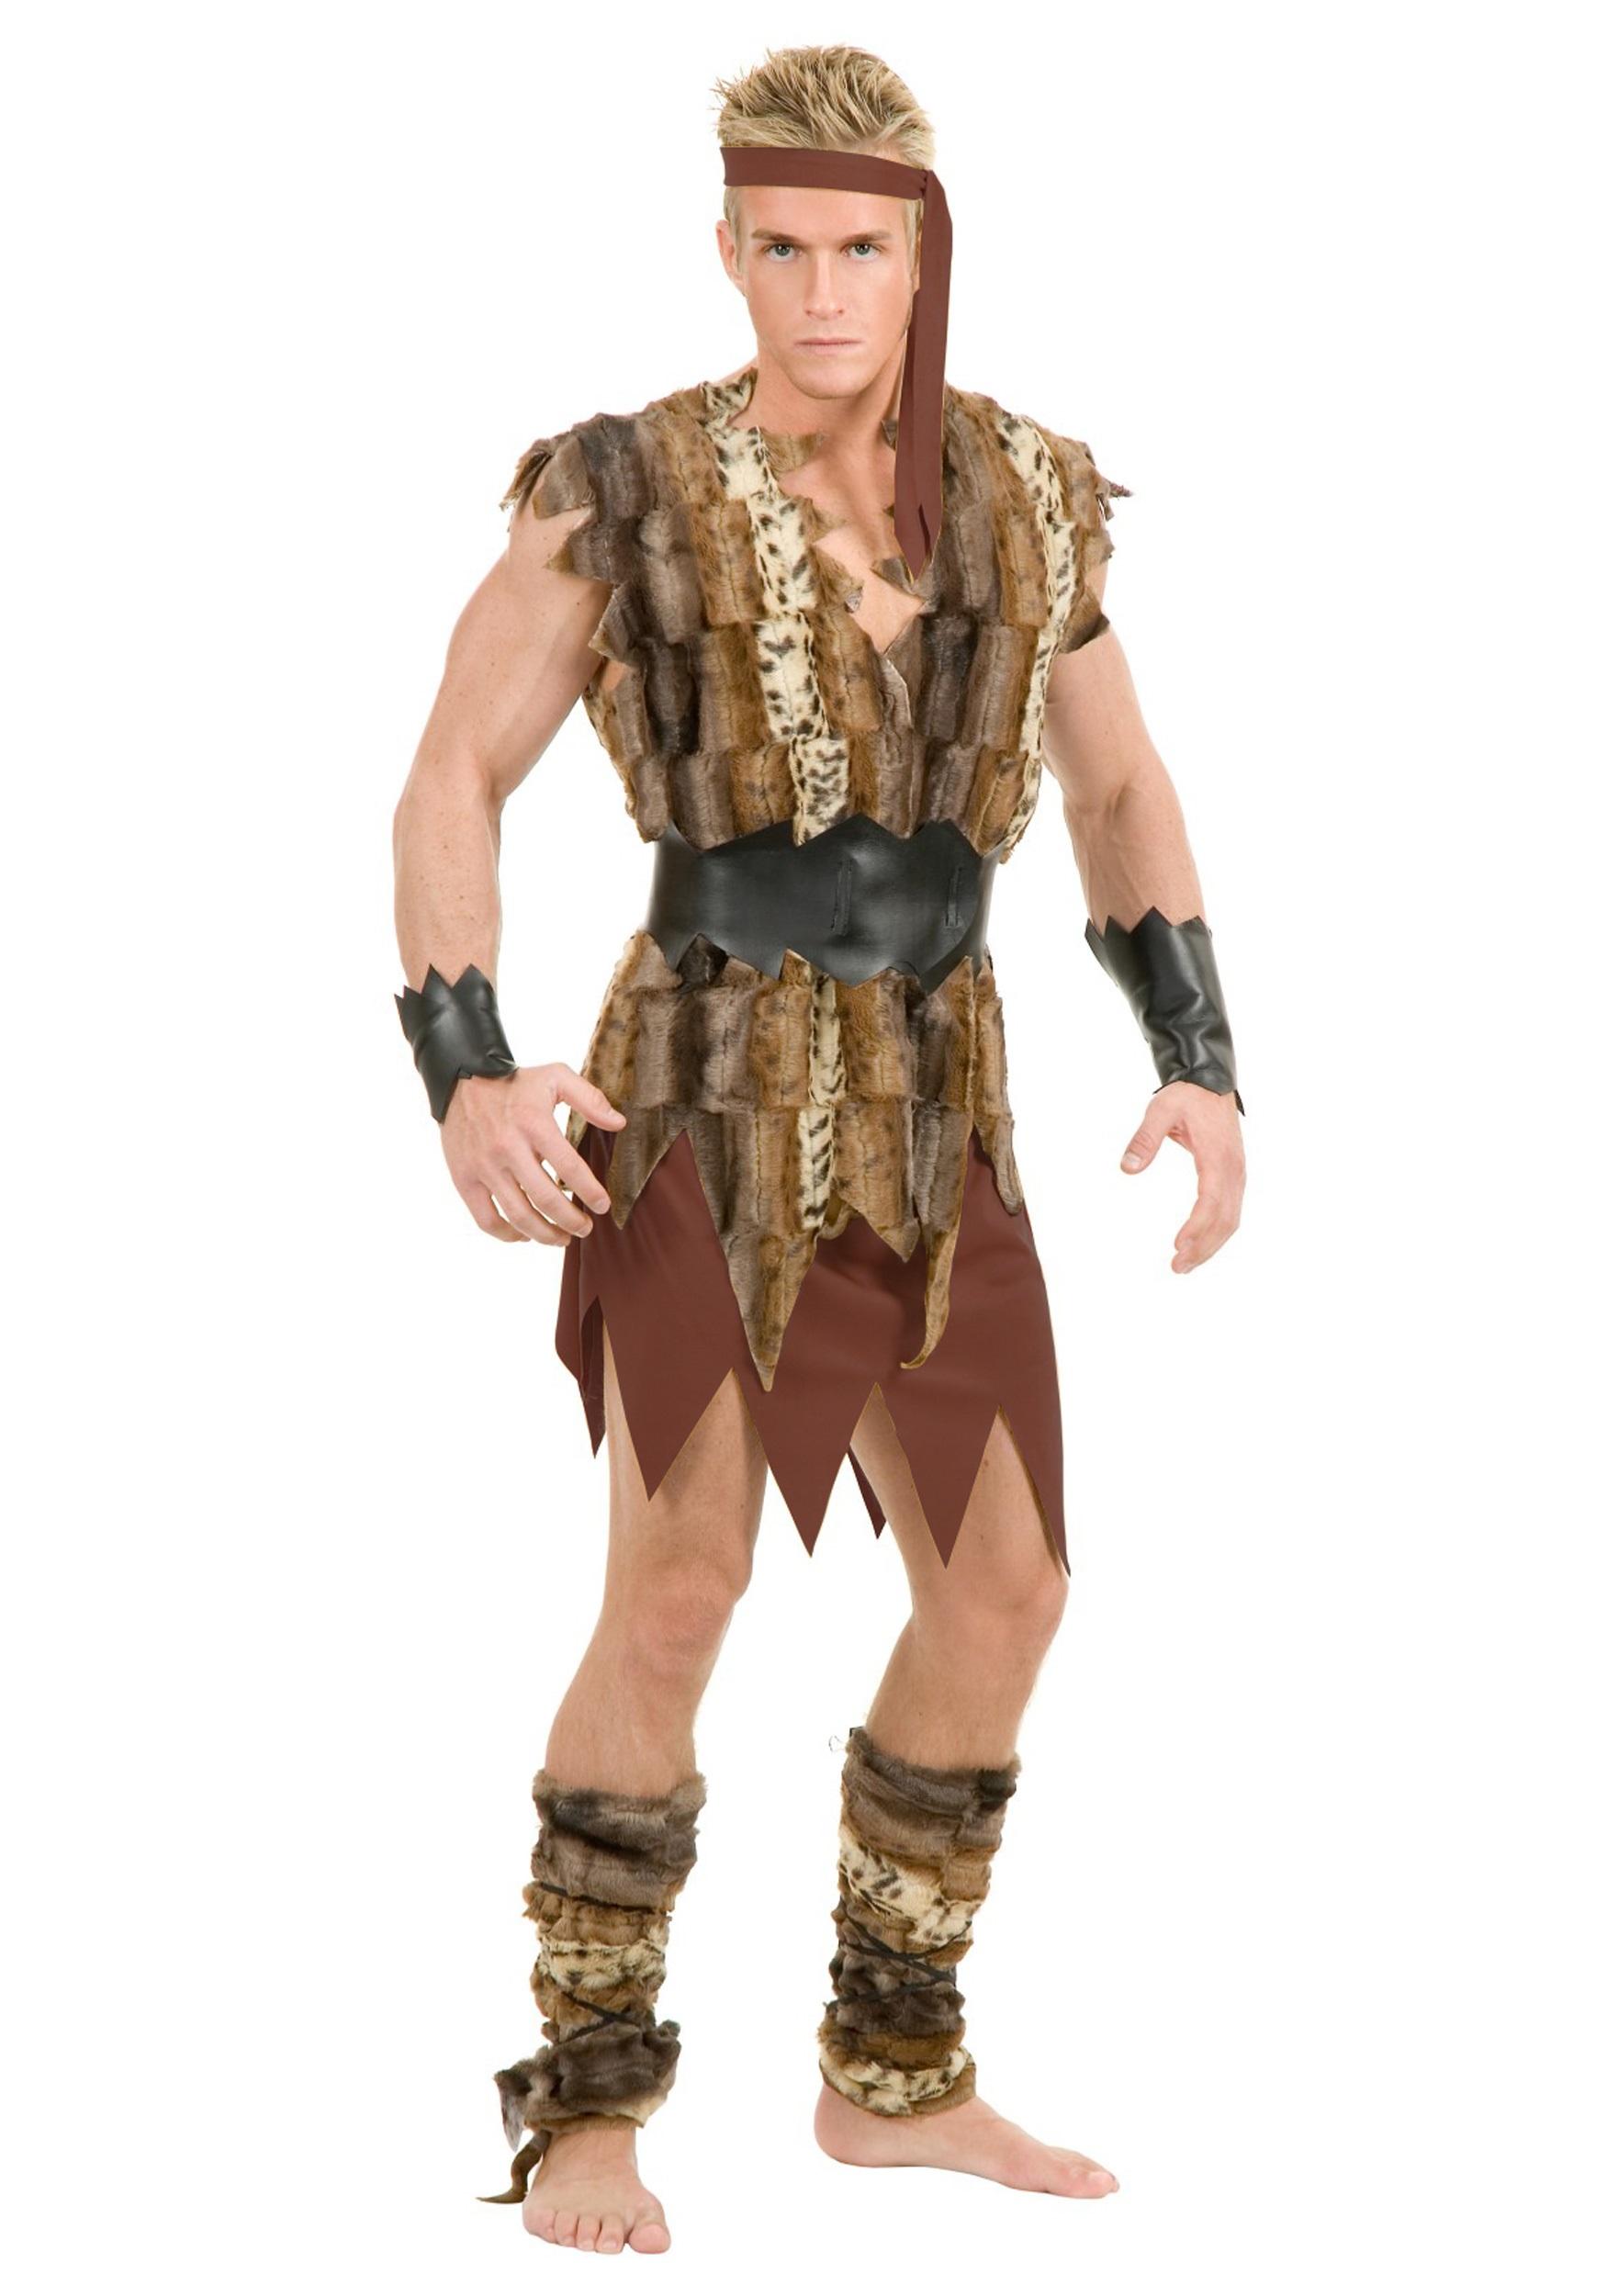 Caveman Dress Up Ideas : Cool caveman costume